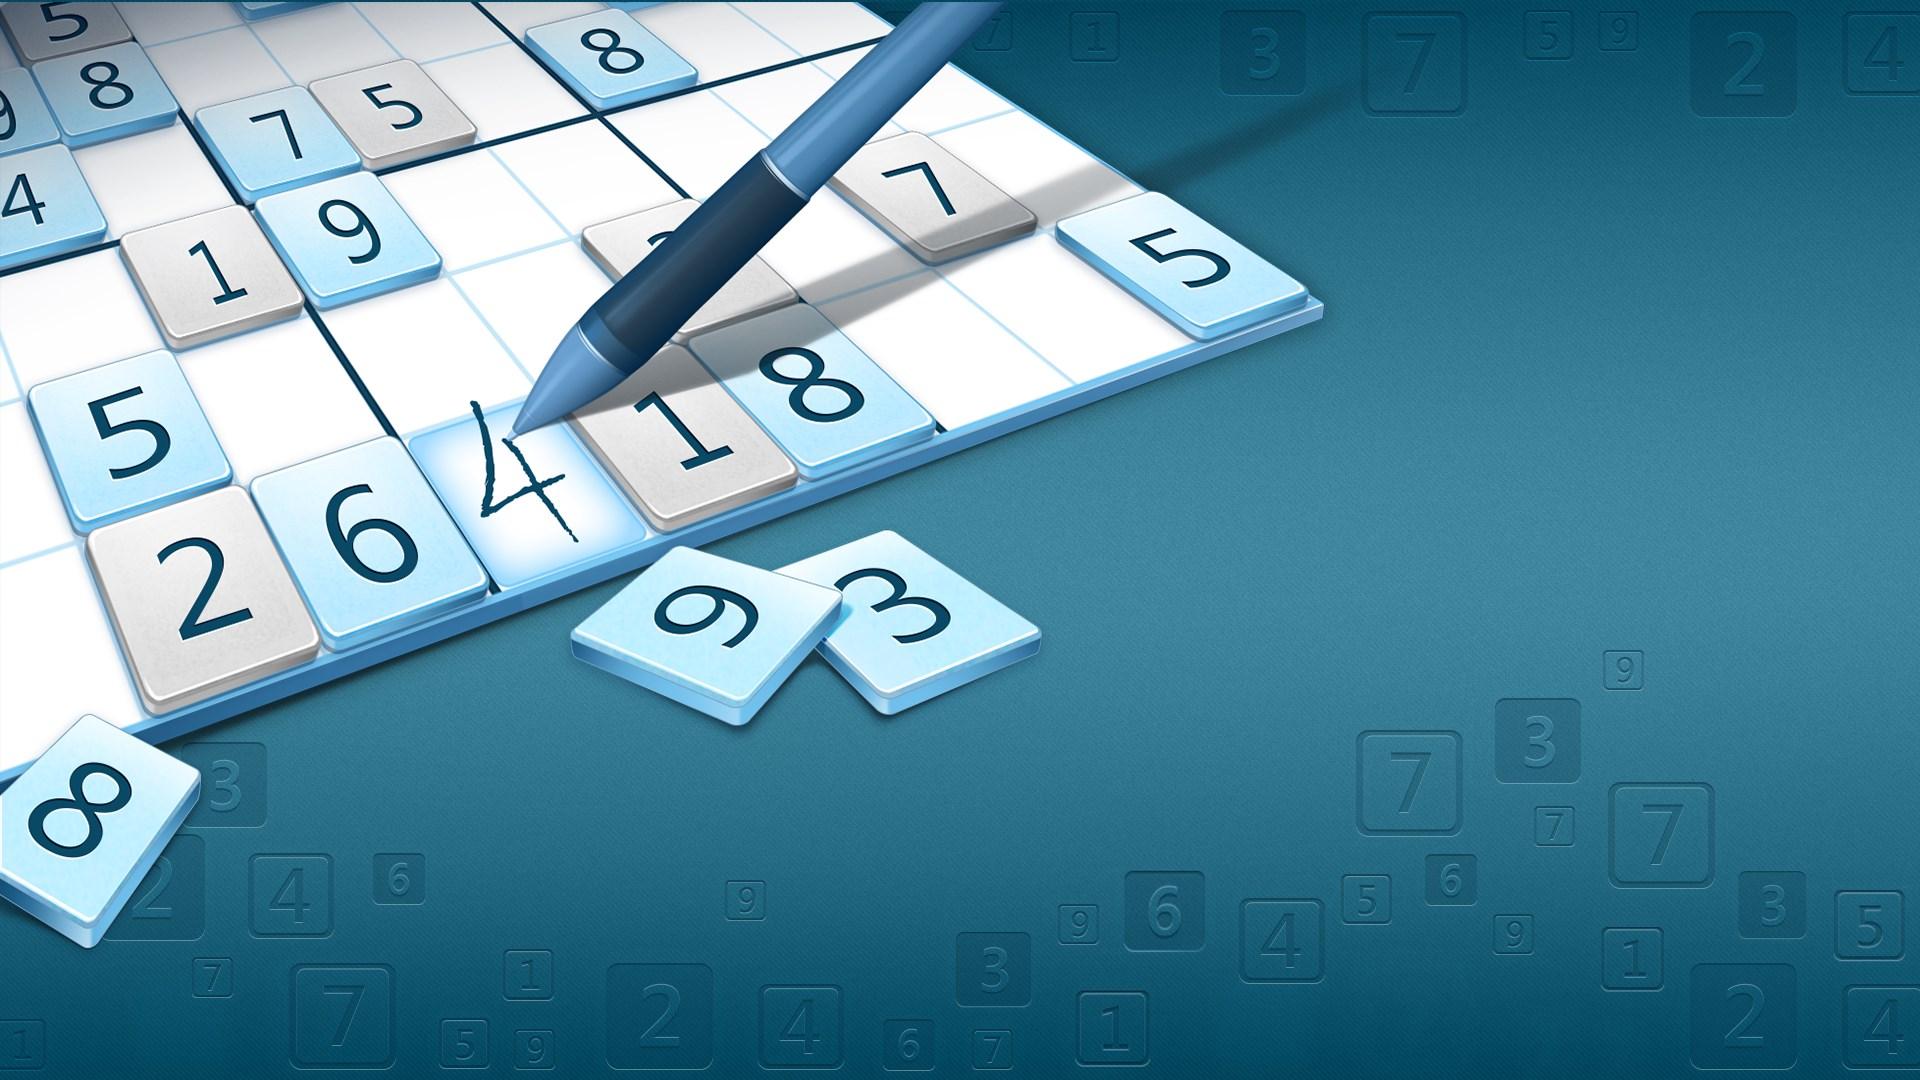 「Sudoku」外出先で数独